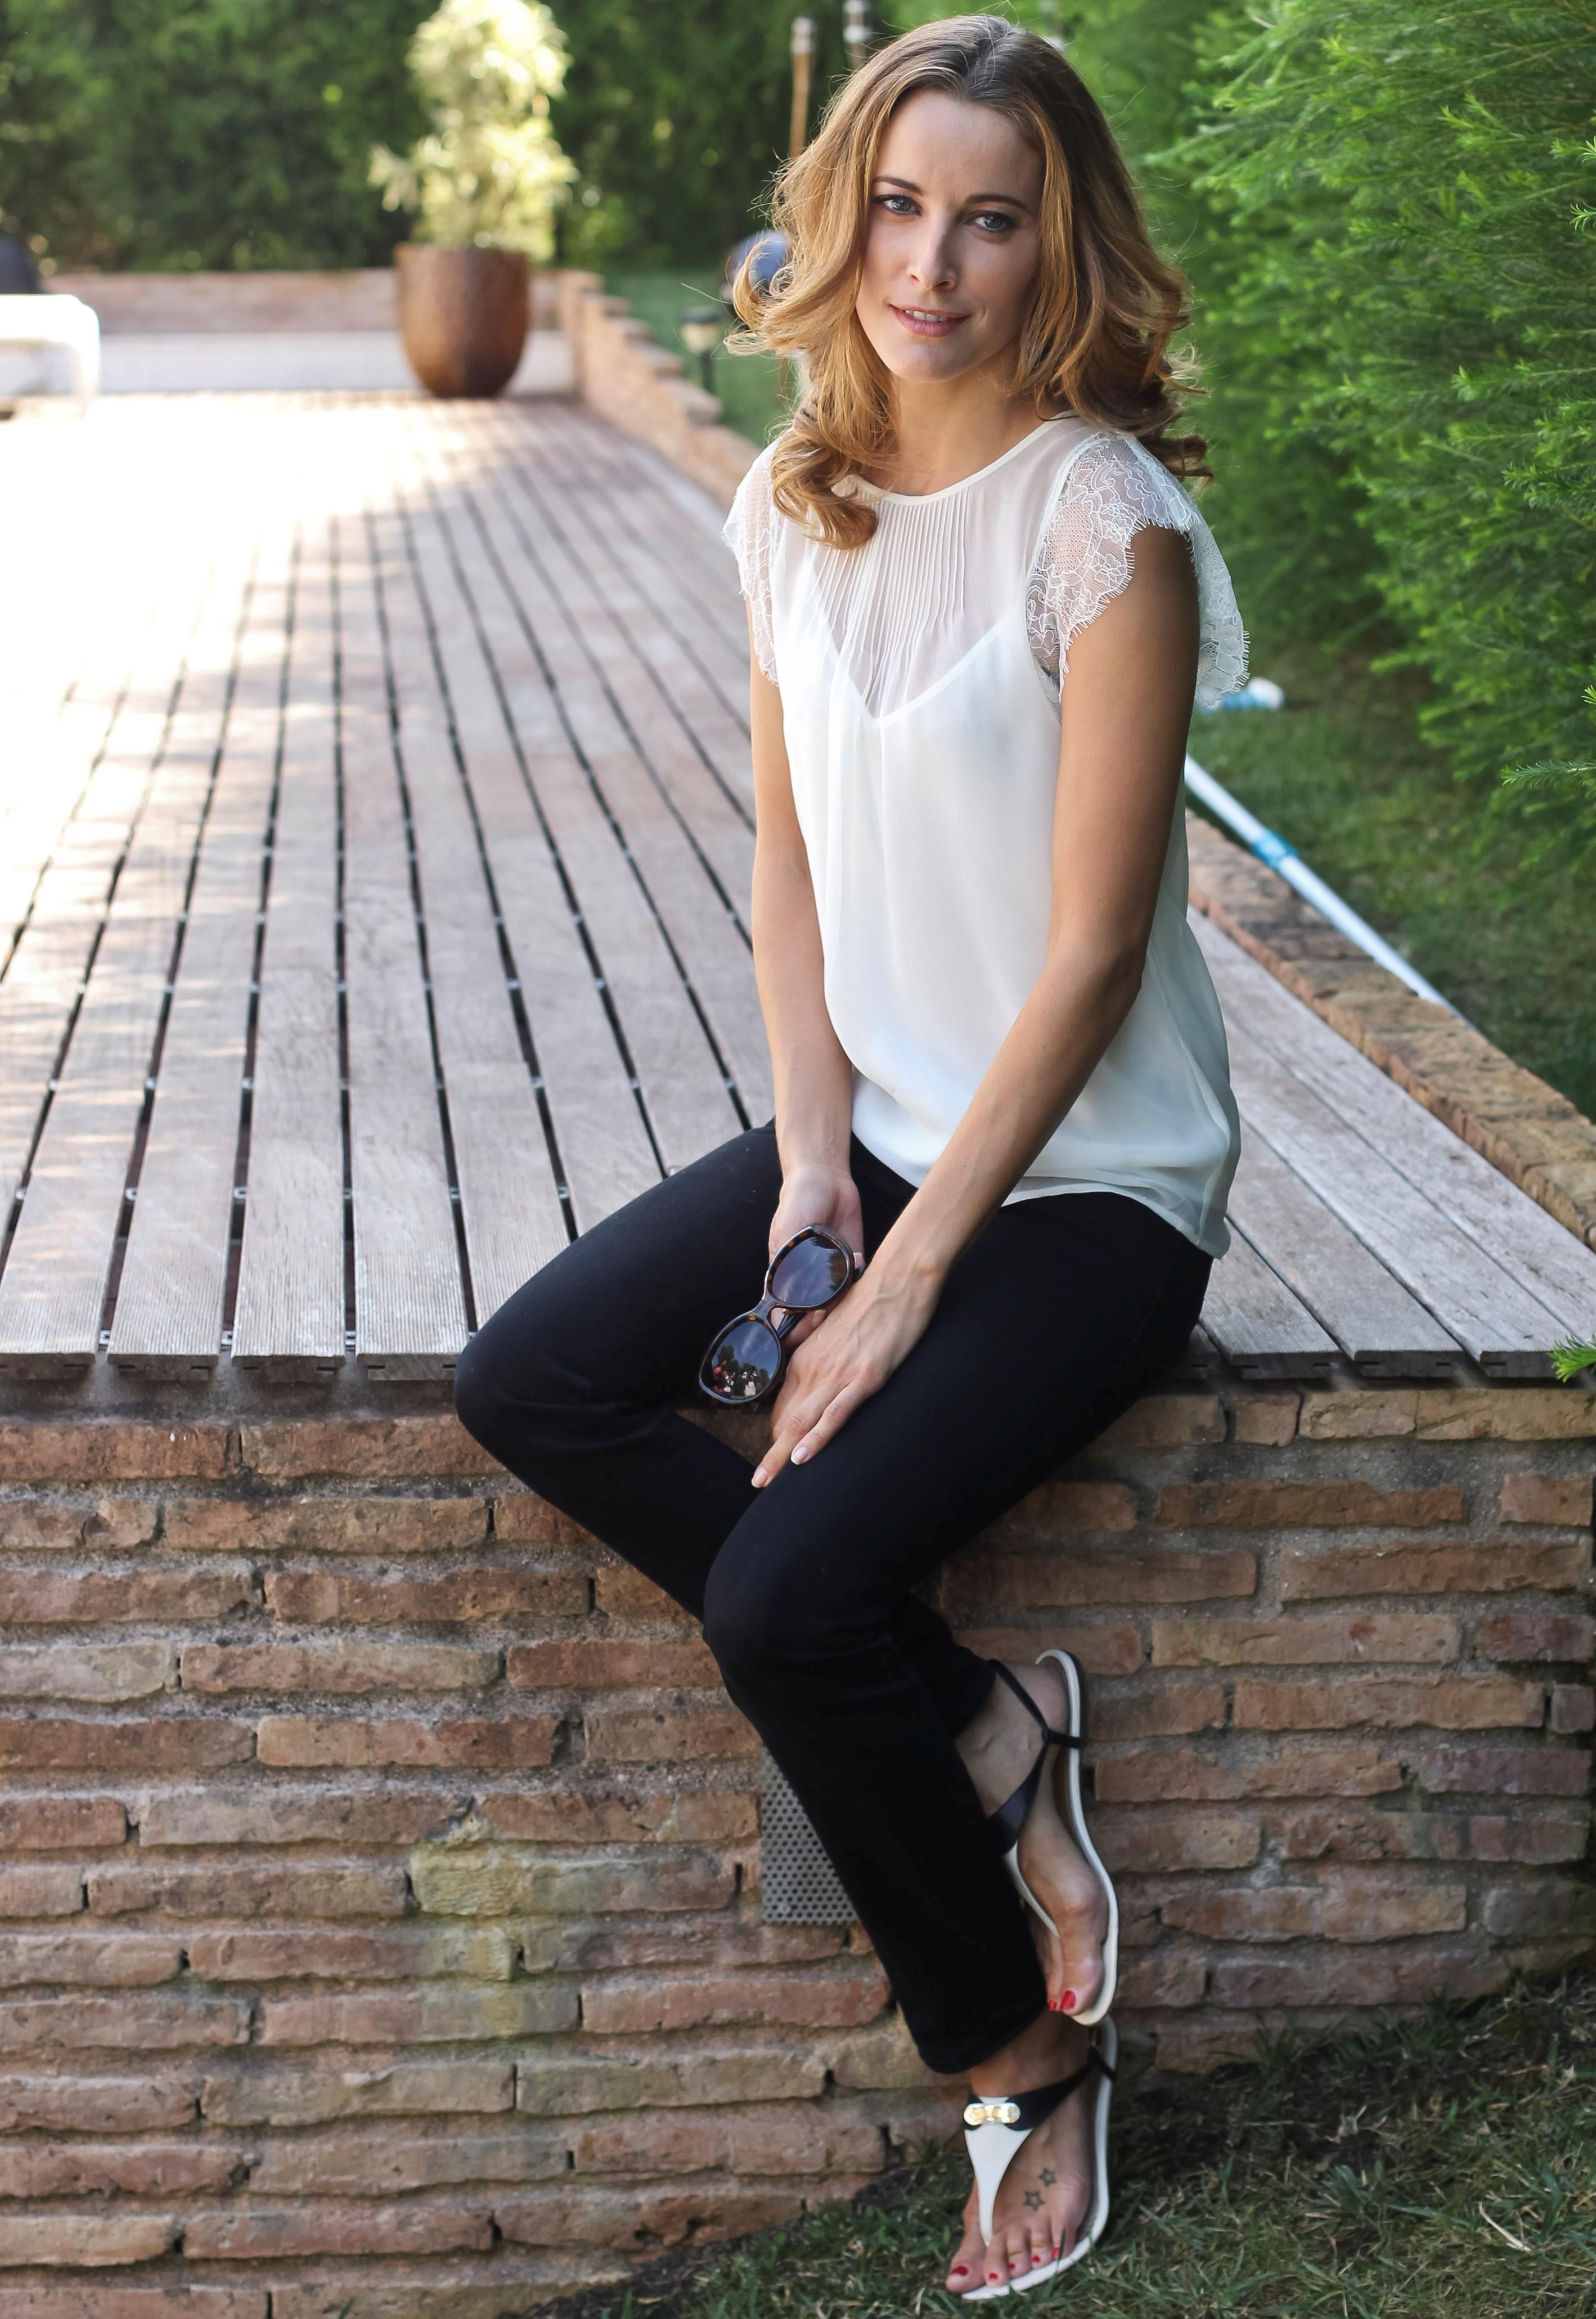 http://pics.wikifeet.com/Maria-Jo%C3%A3o-Bastos-Feet-1098119.jpg